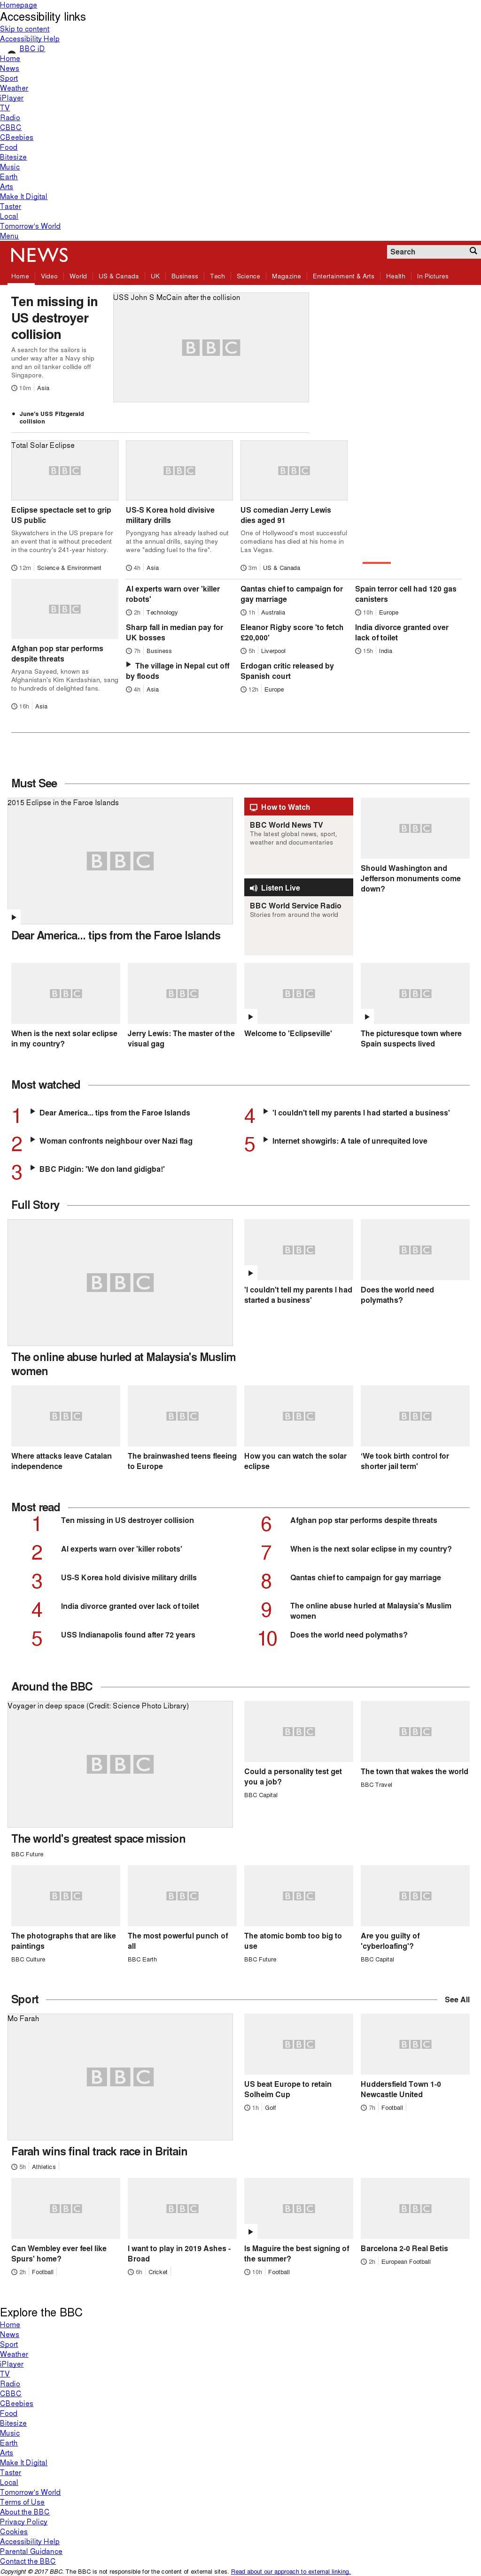 BBC at Monday Aug. 21, 2017, 6:01 a.m. UTC